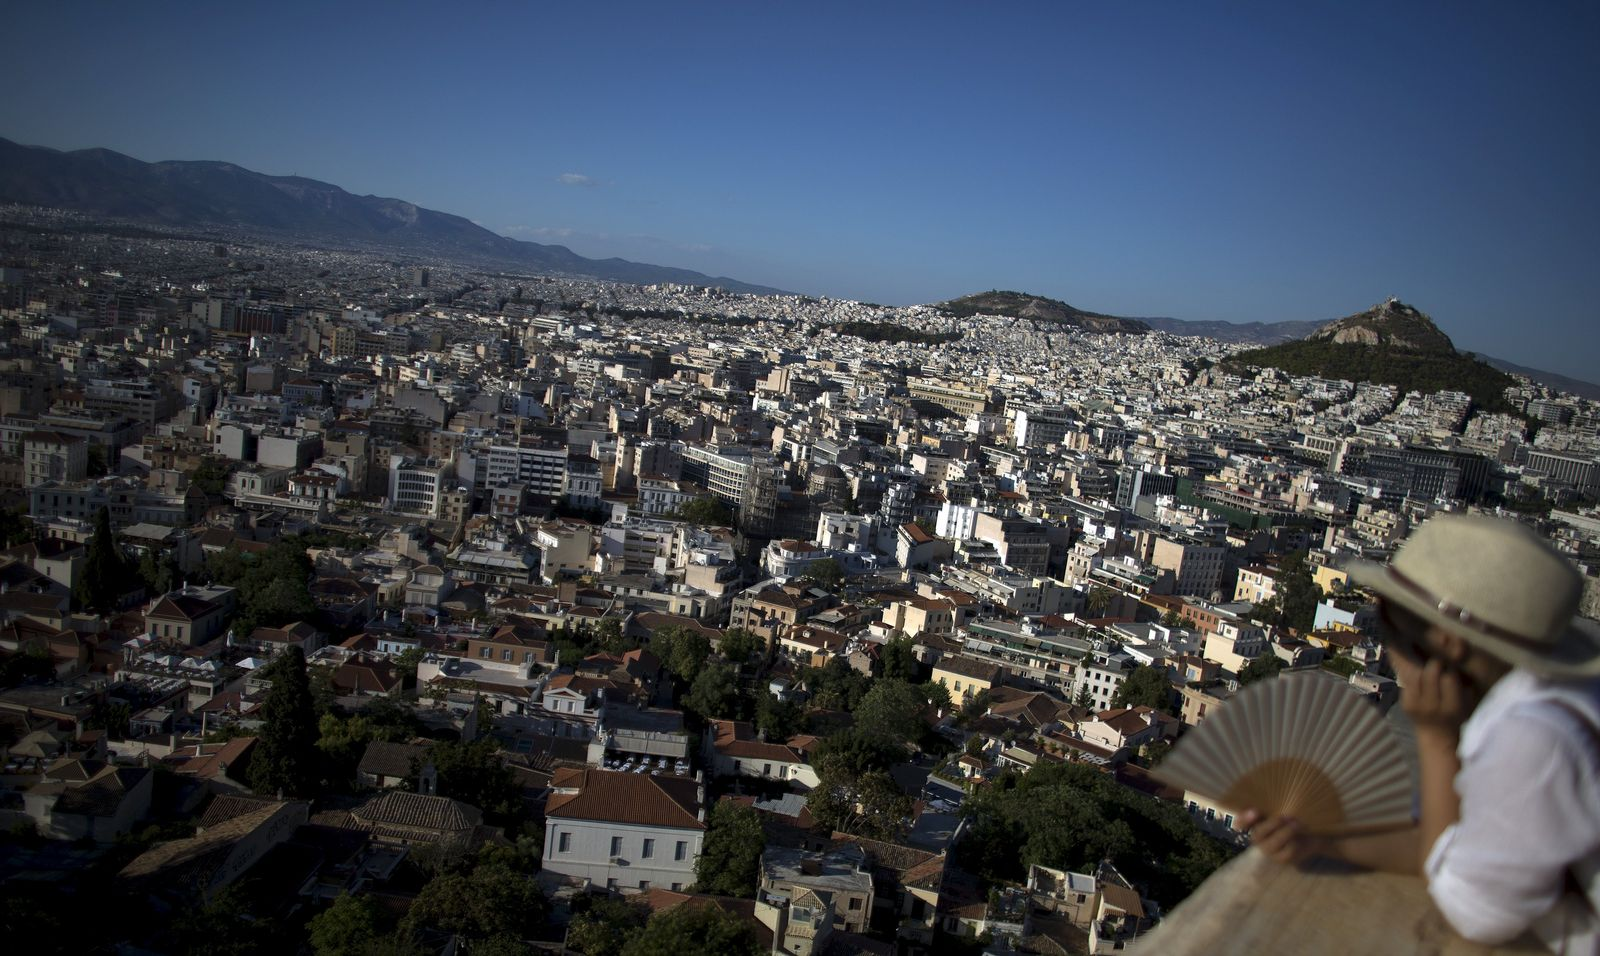 GREECE-DAILYLIFE/